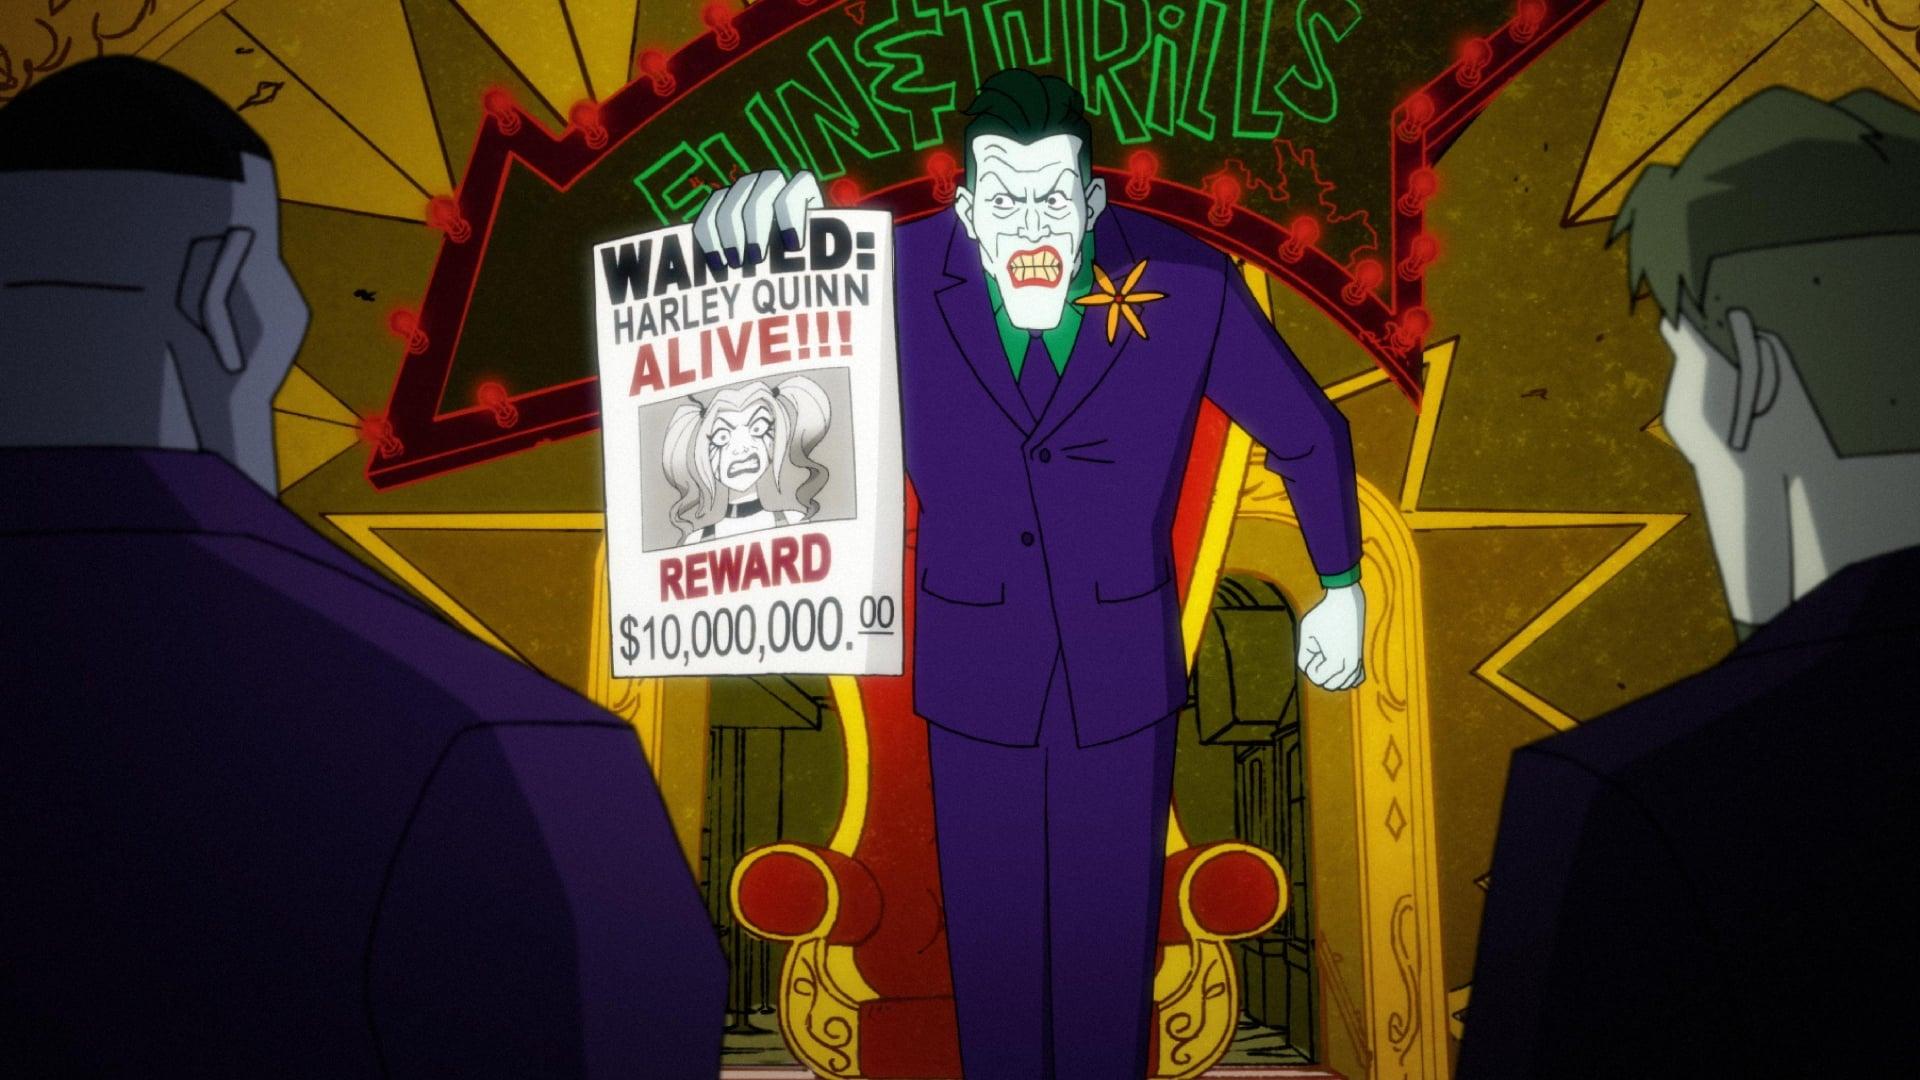 Harley Quinn - Season 1 Episode 13 : The Final Joke